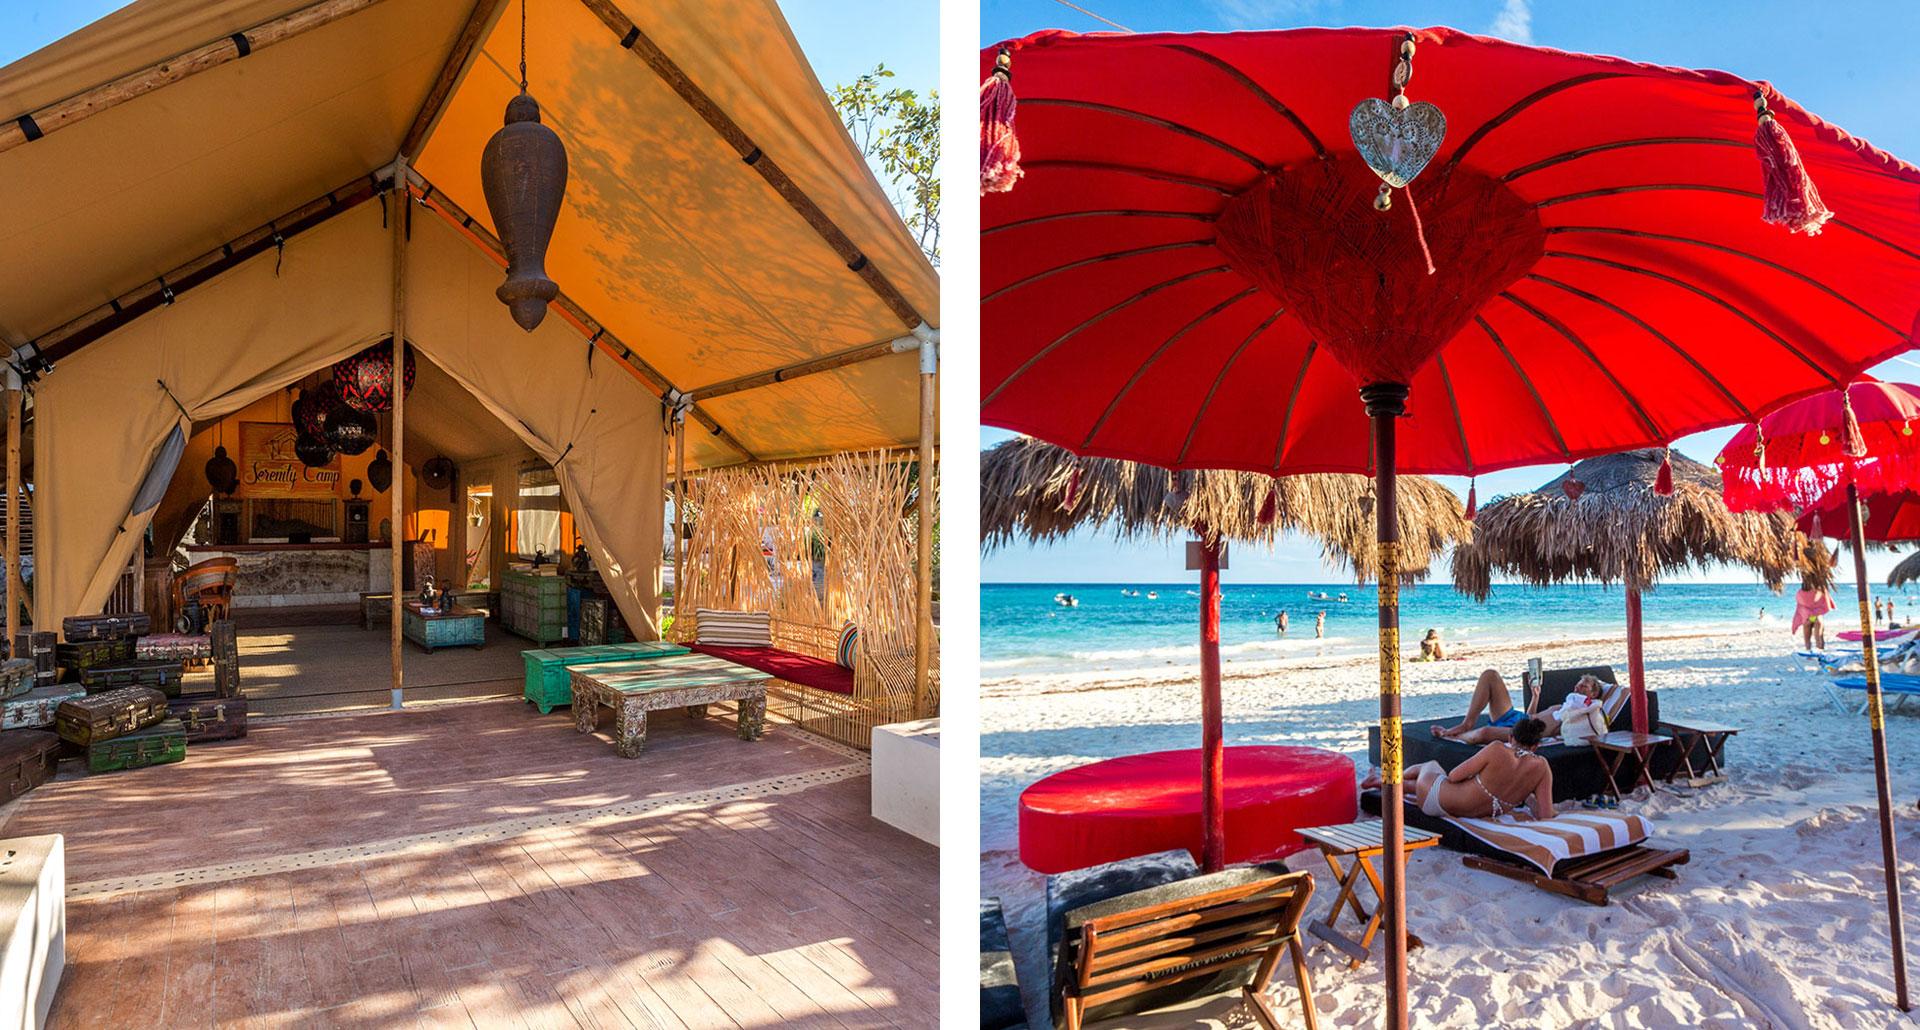 Serenity Eco Luxury Tented Camp - boutique hotel in Playa del Carmen